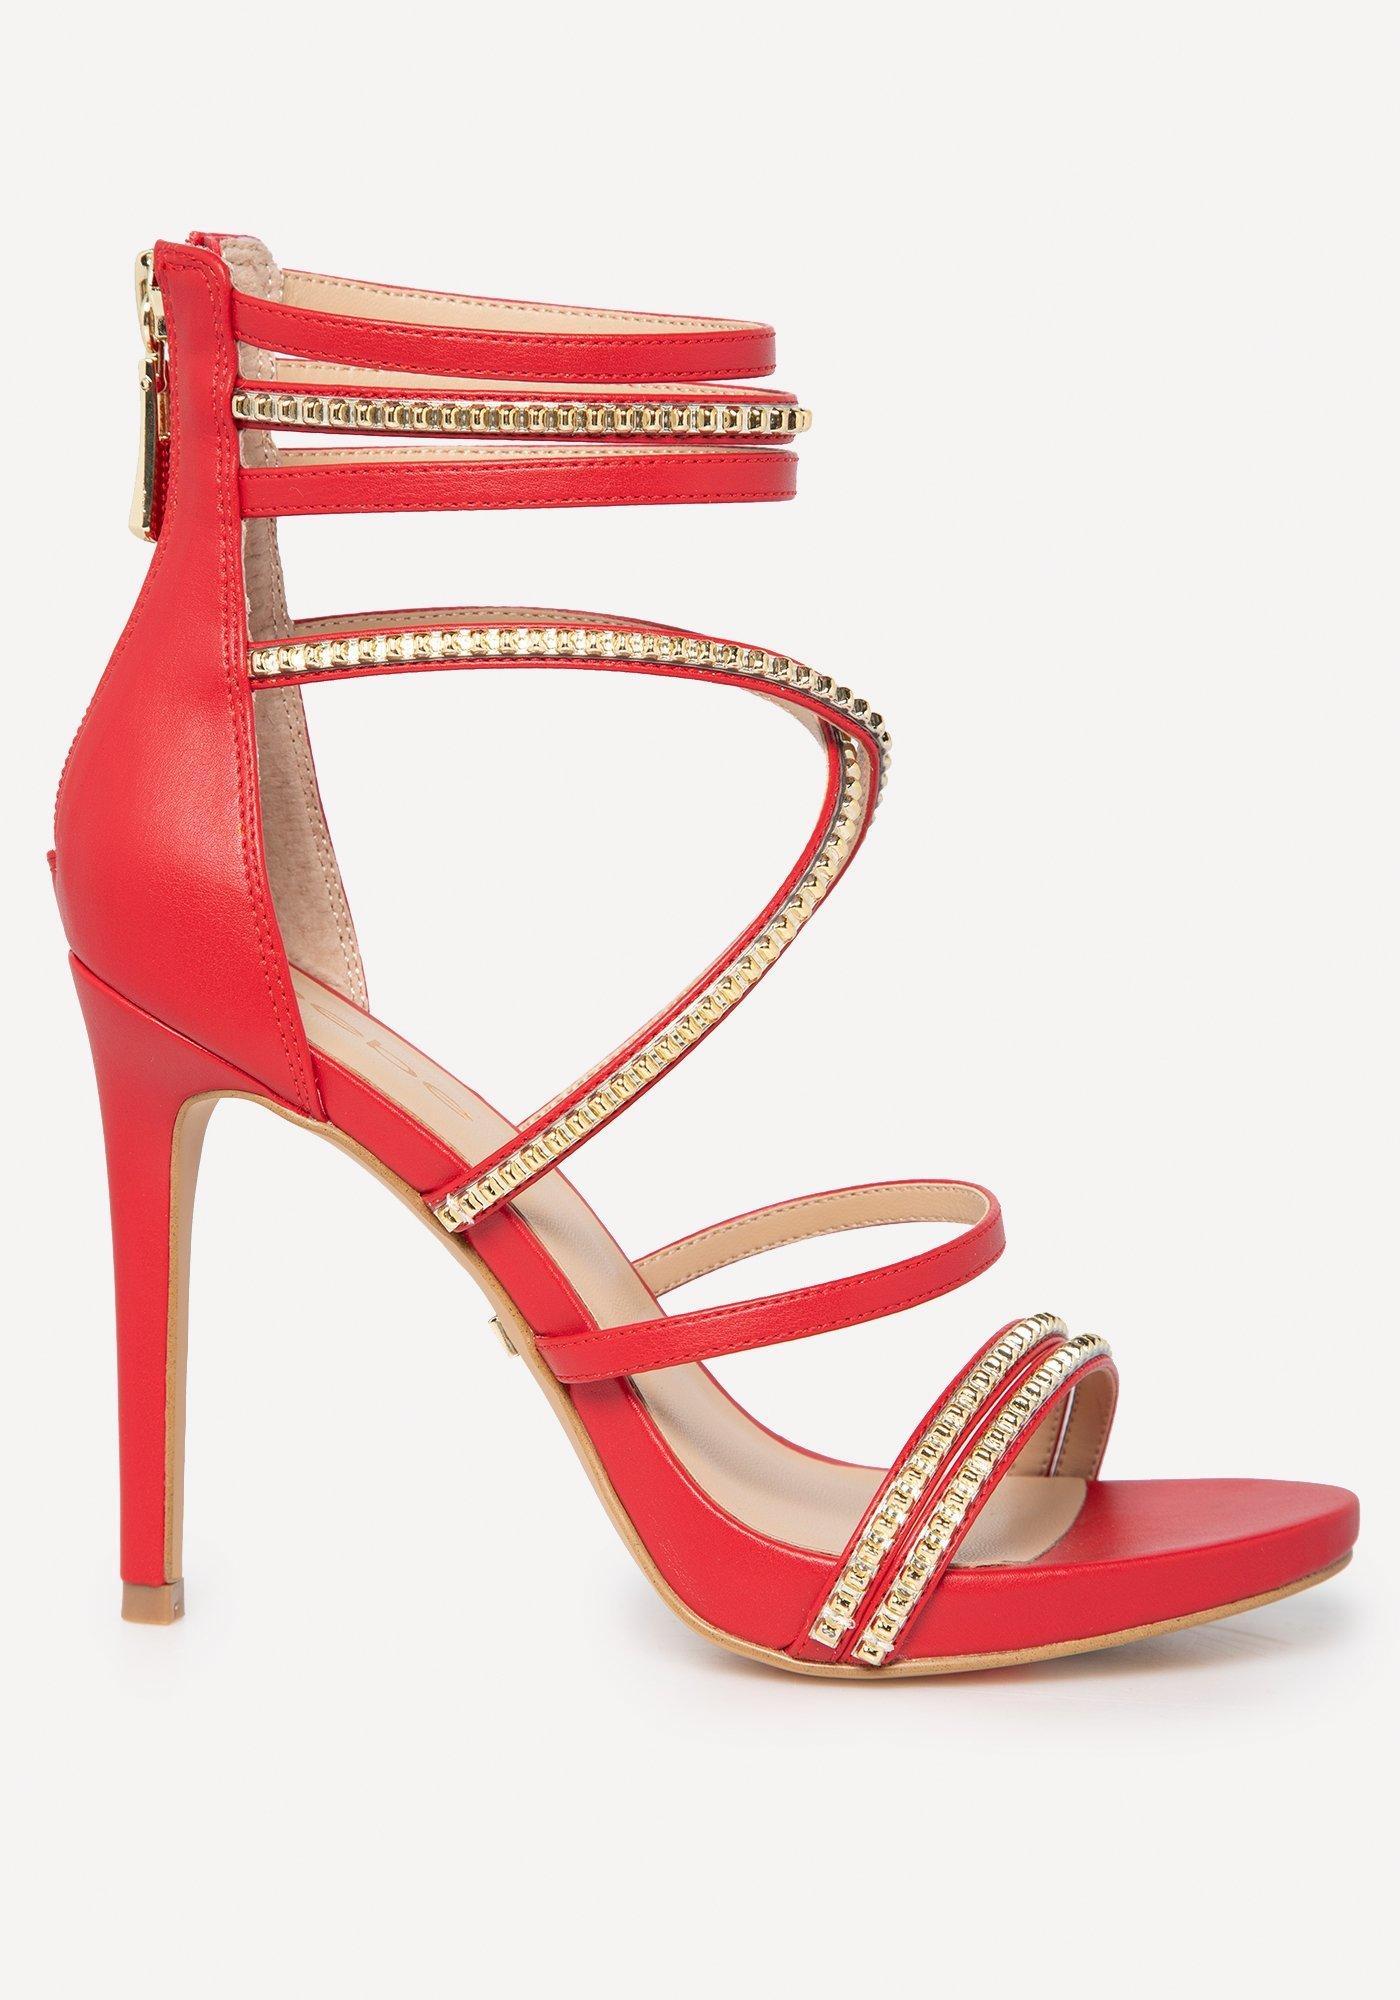 474e93176fb Bebe - Red Bettyy Braid   Stud Strappy Sandals - Lyst. View fullscreen